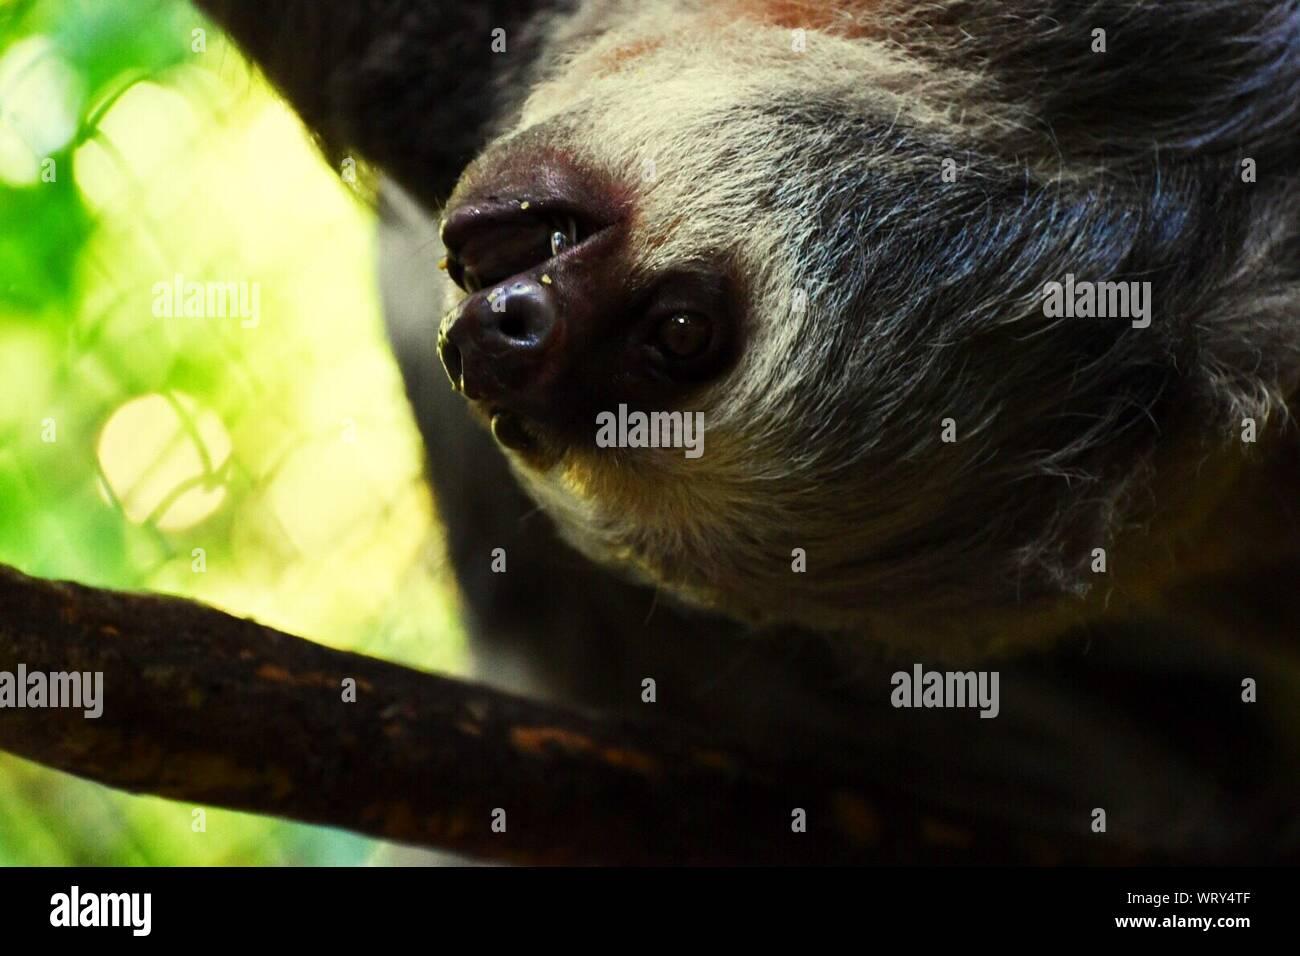 Close-up Of Sloth On Tree Stock Photo